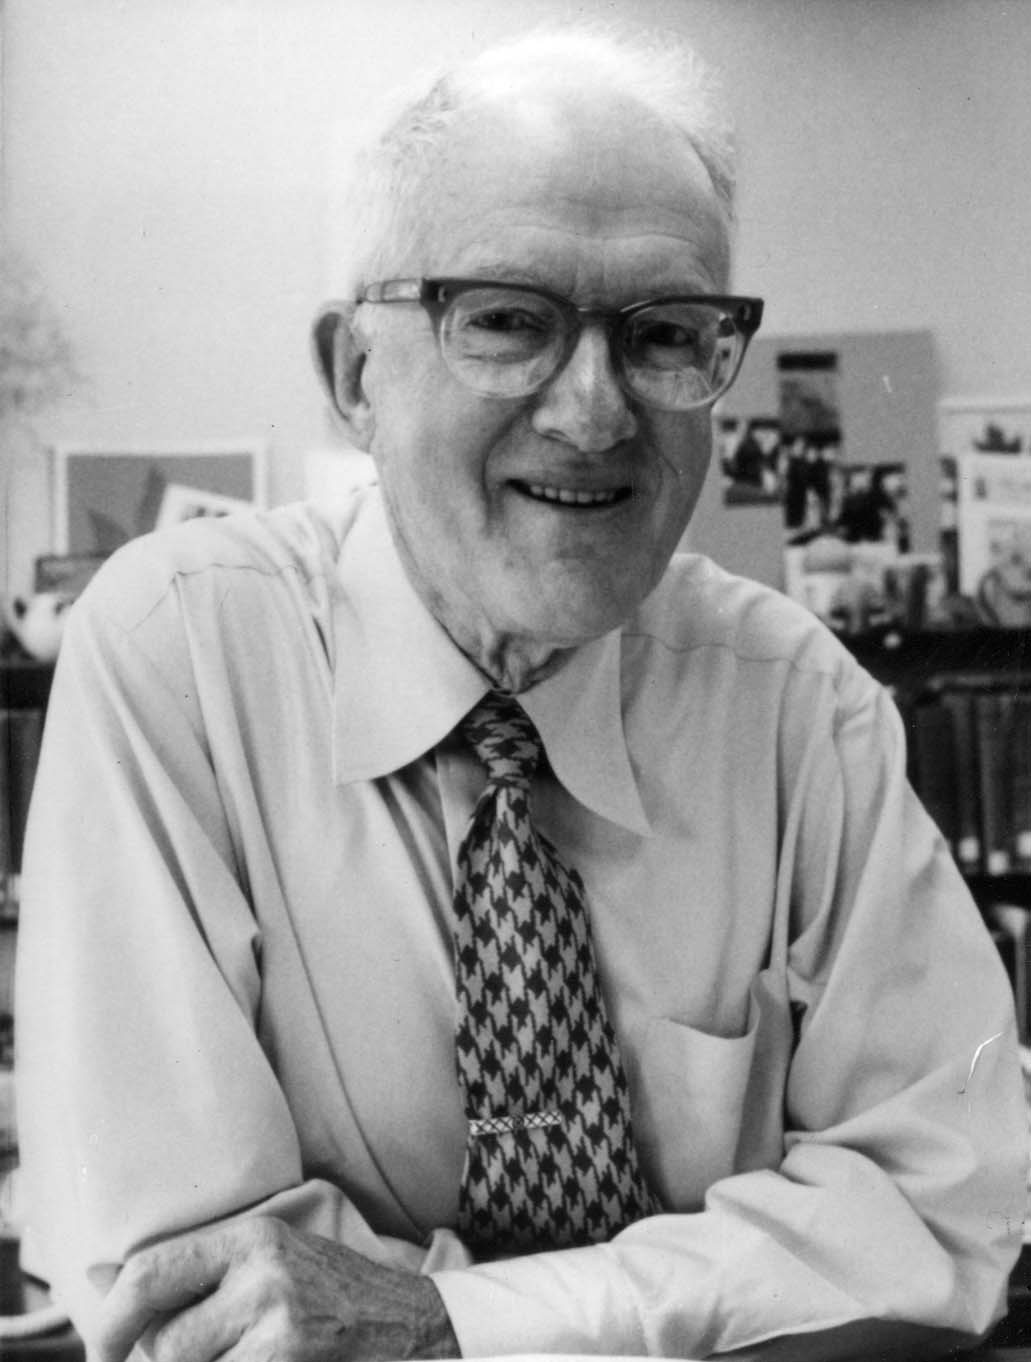 image of John Thomas Howell